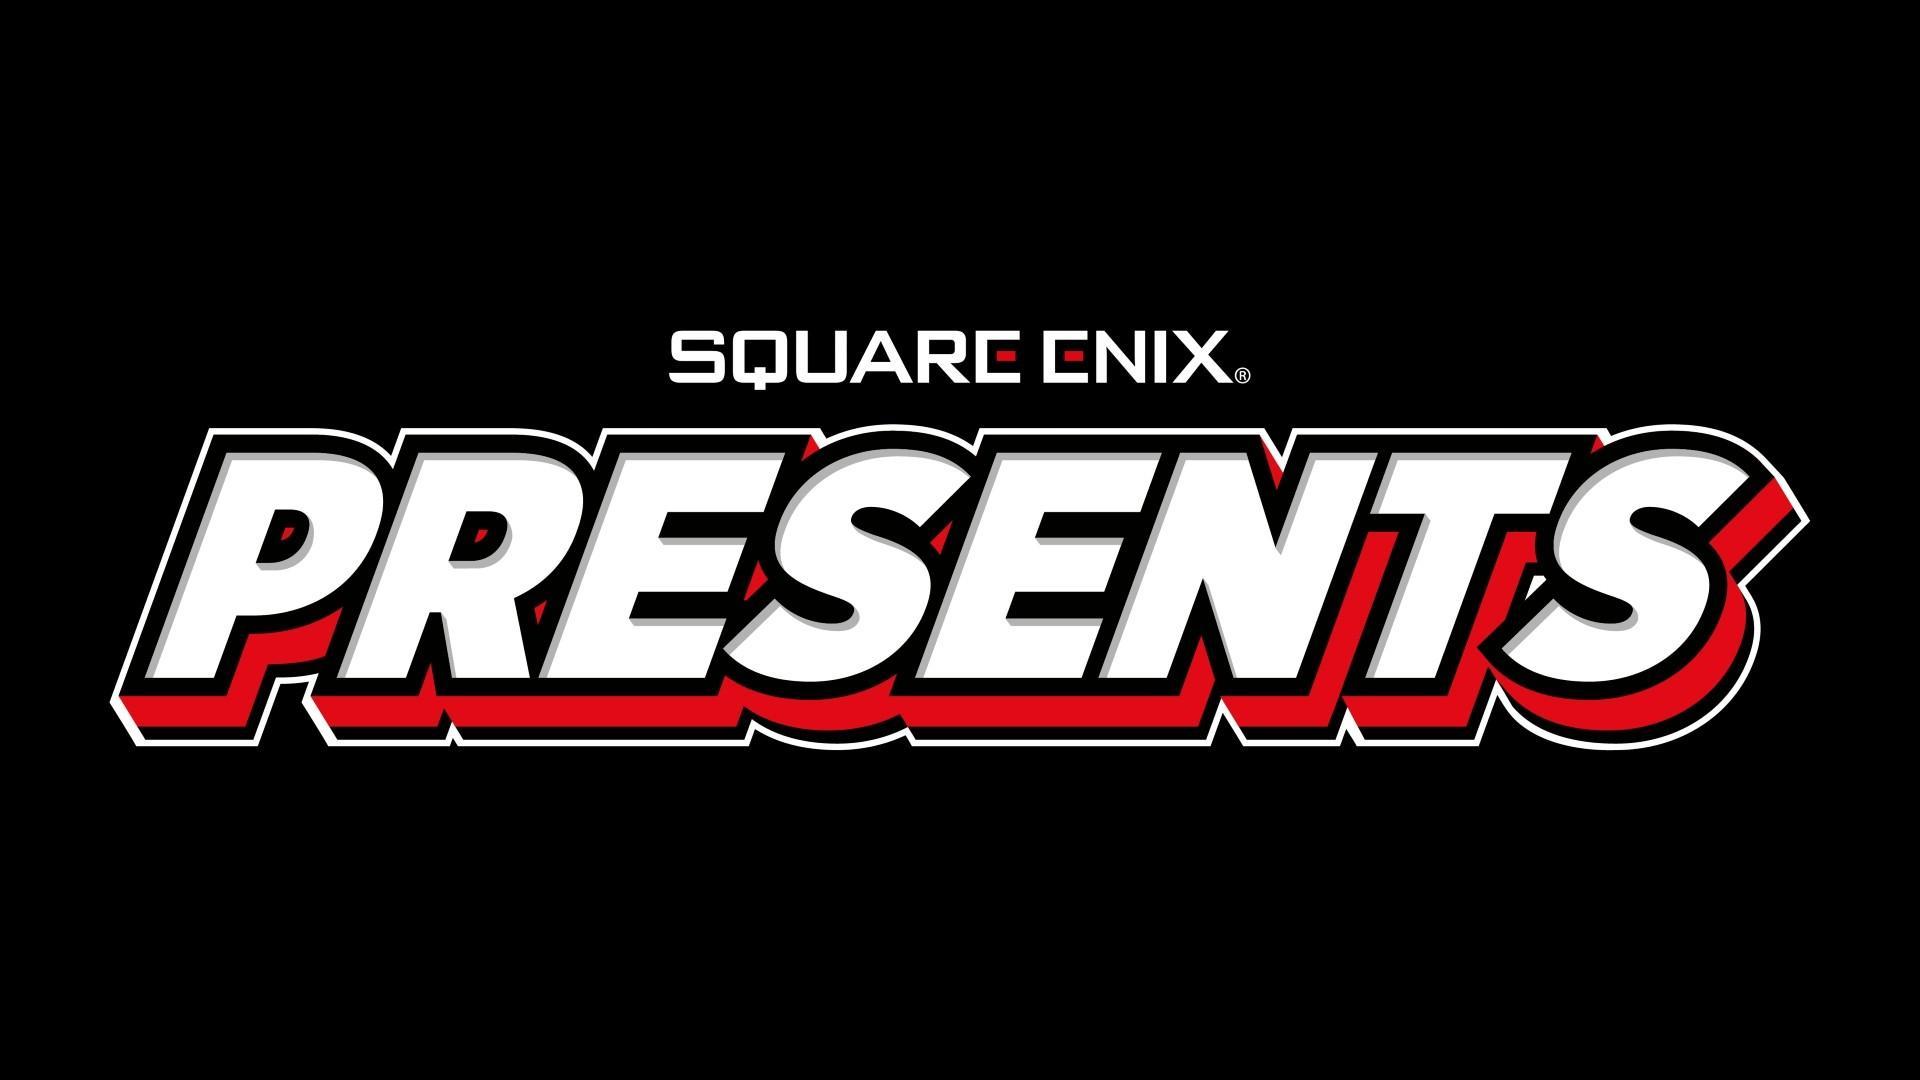 Презентация Square Enix Presents пройдет 18 марта 3